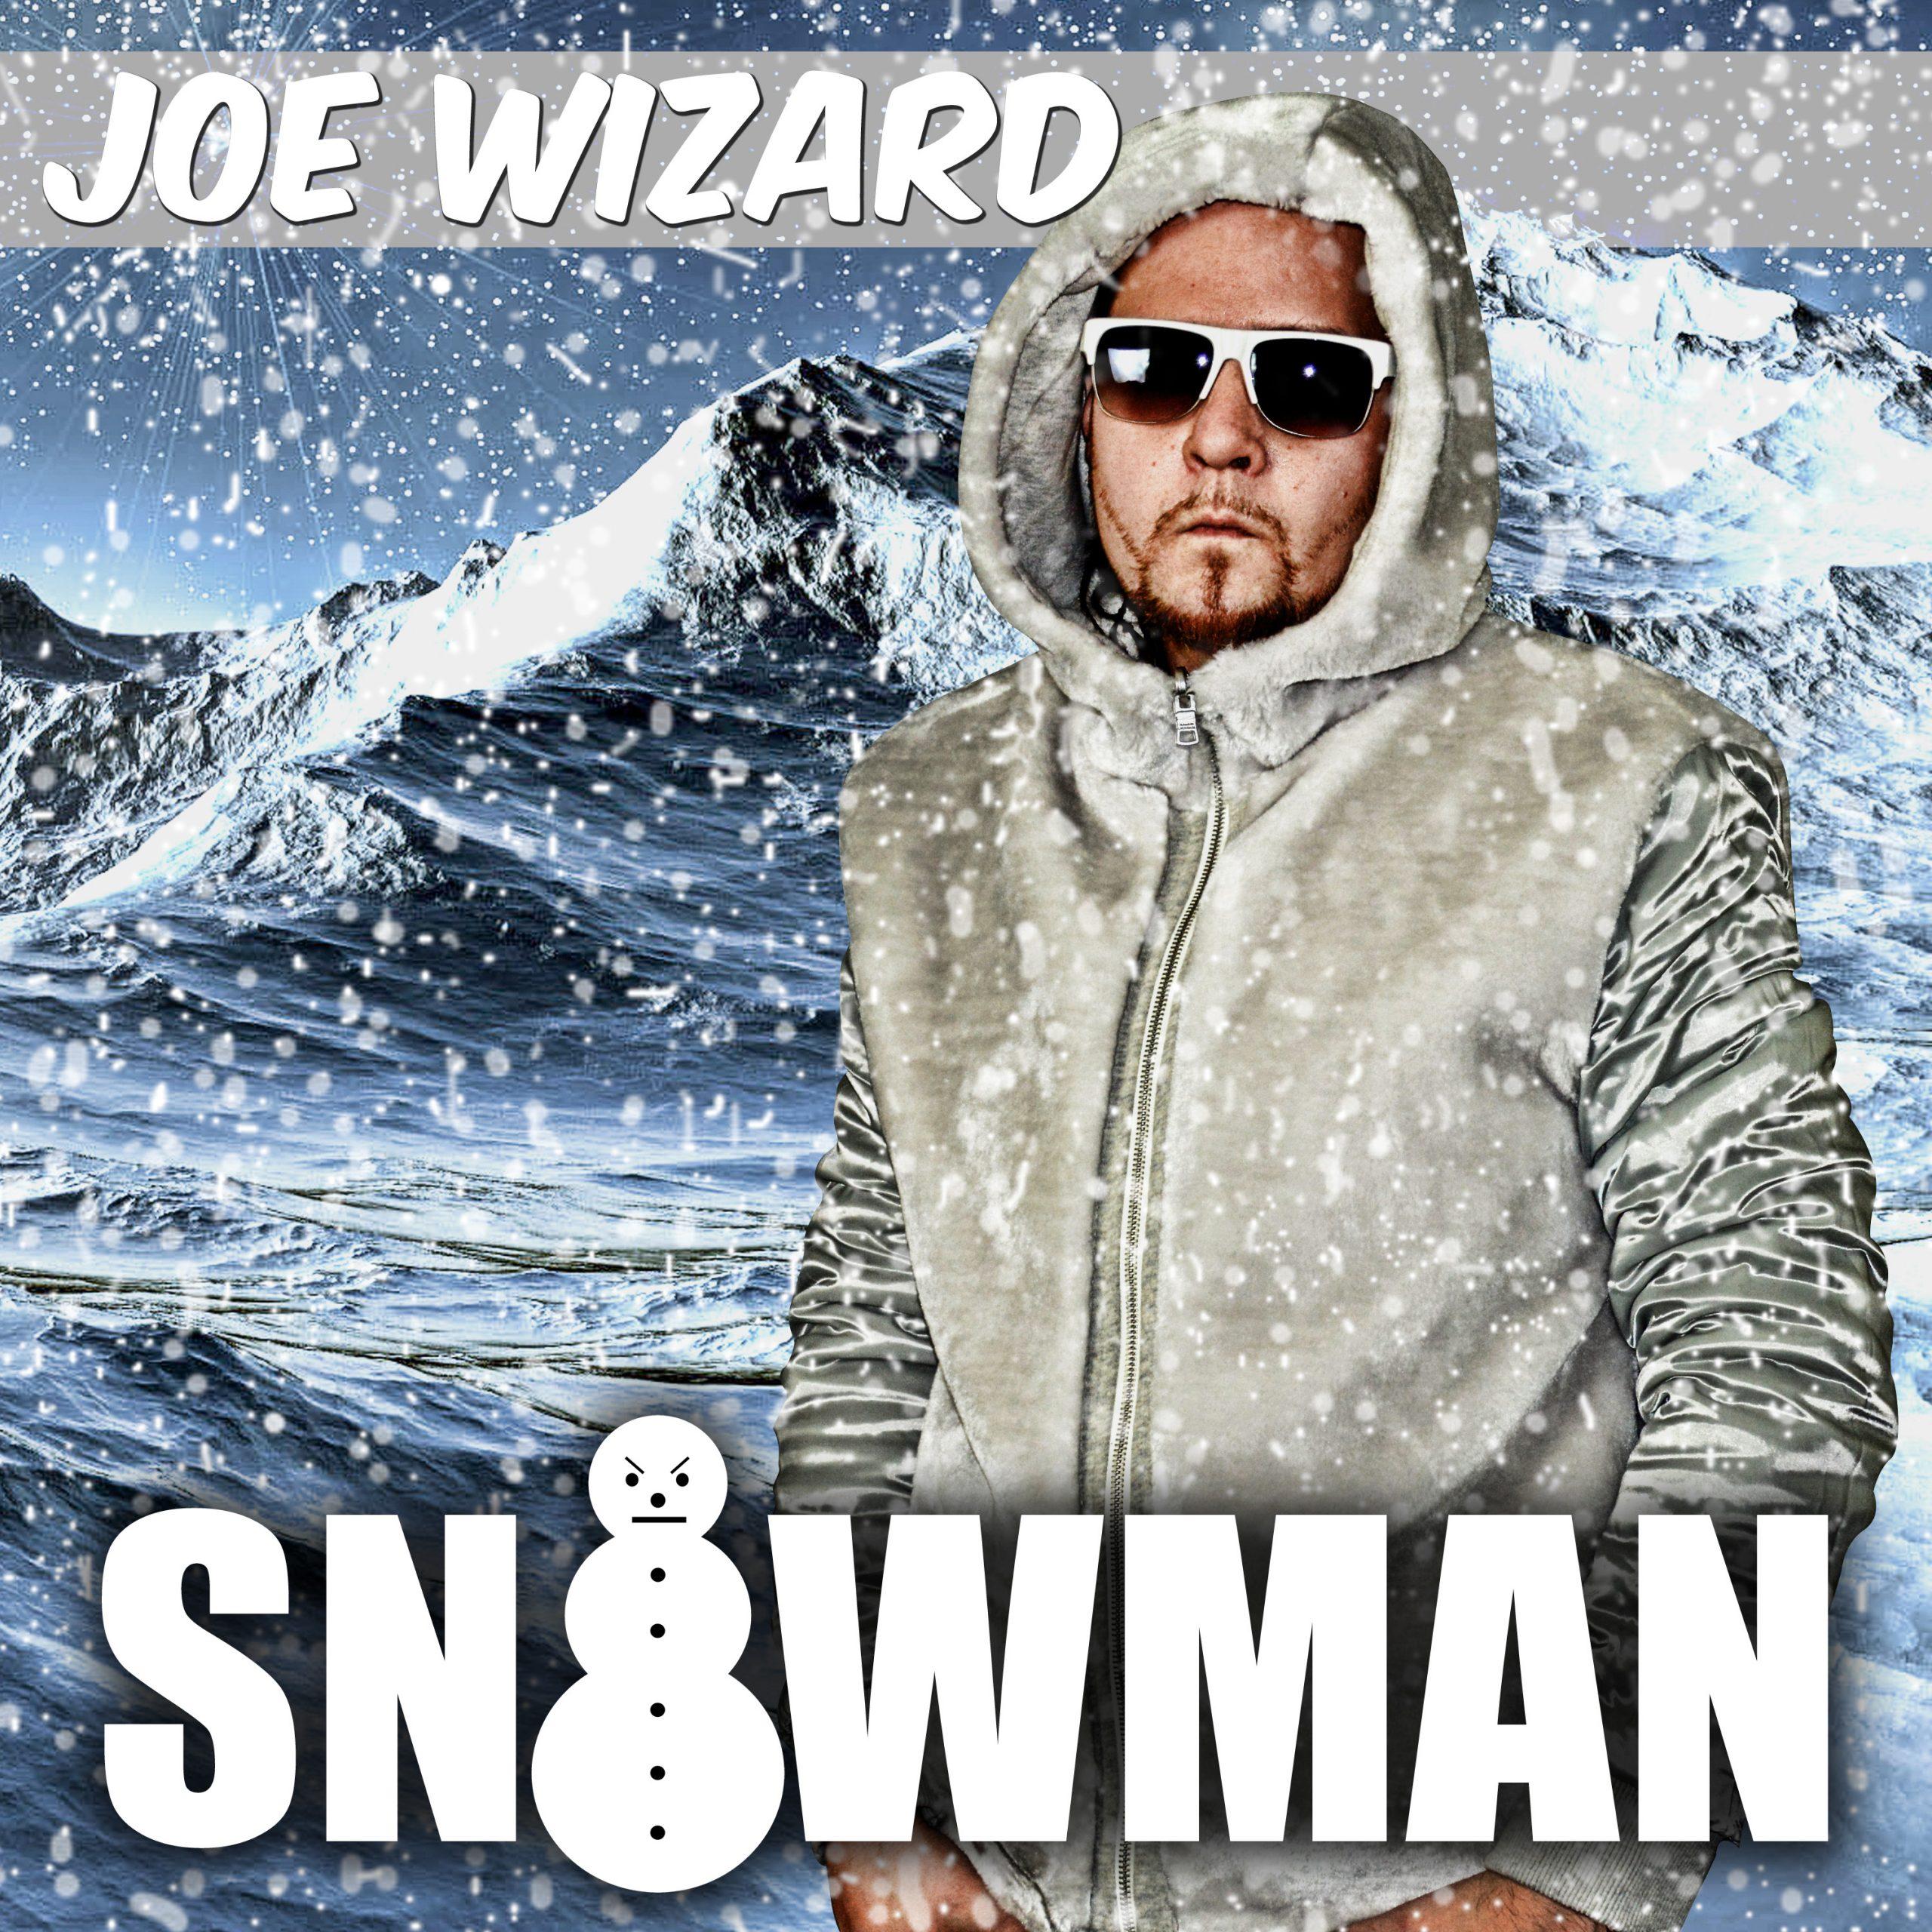 Joe Wizard cover art for Snowman is Joe in the snow